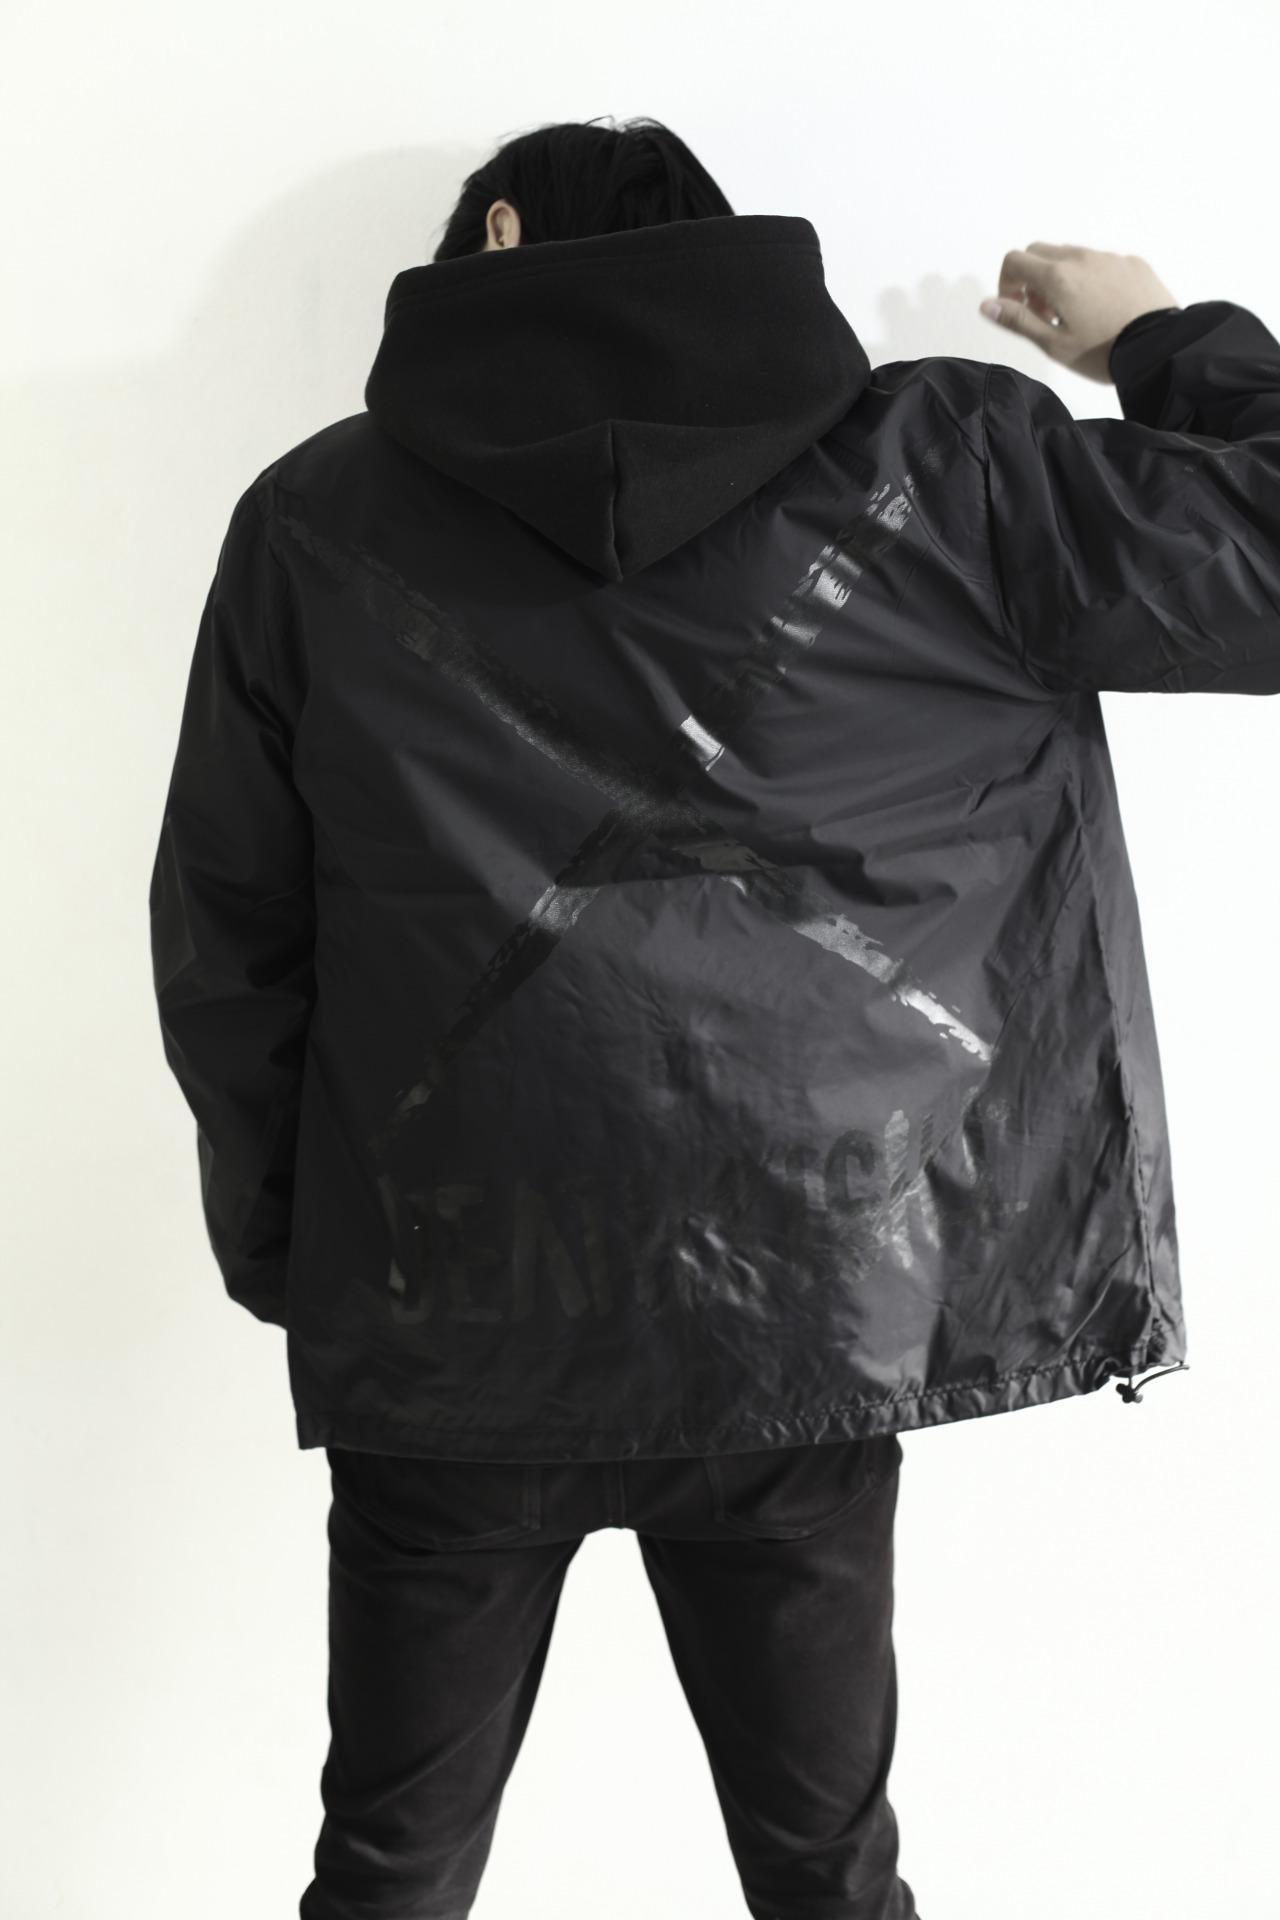 deathsight C JKT / BLACK x BLACK - 画像4